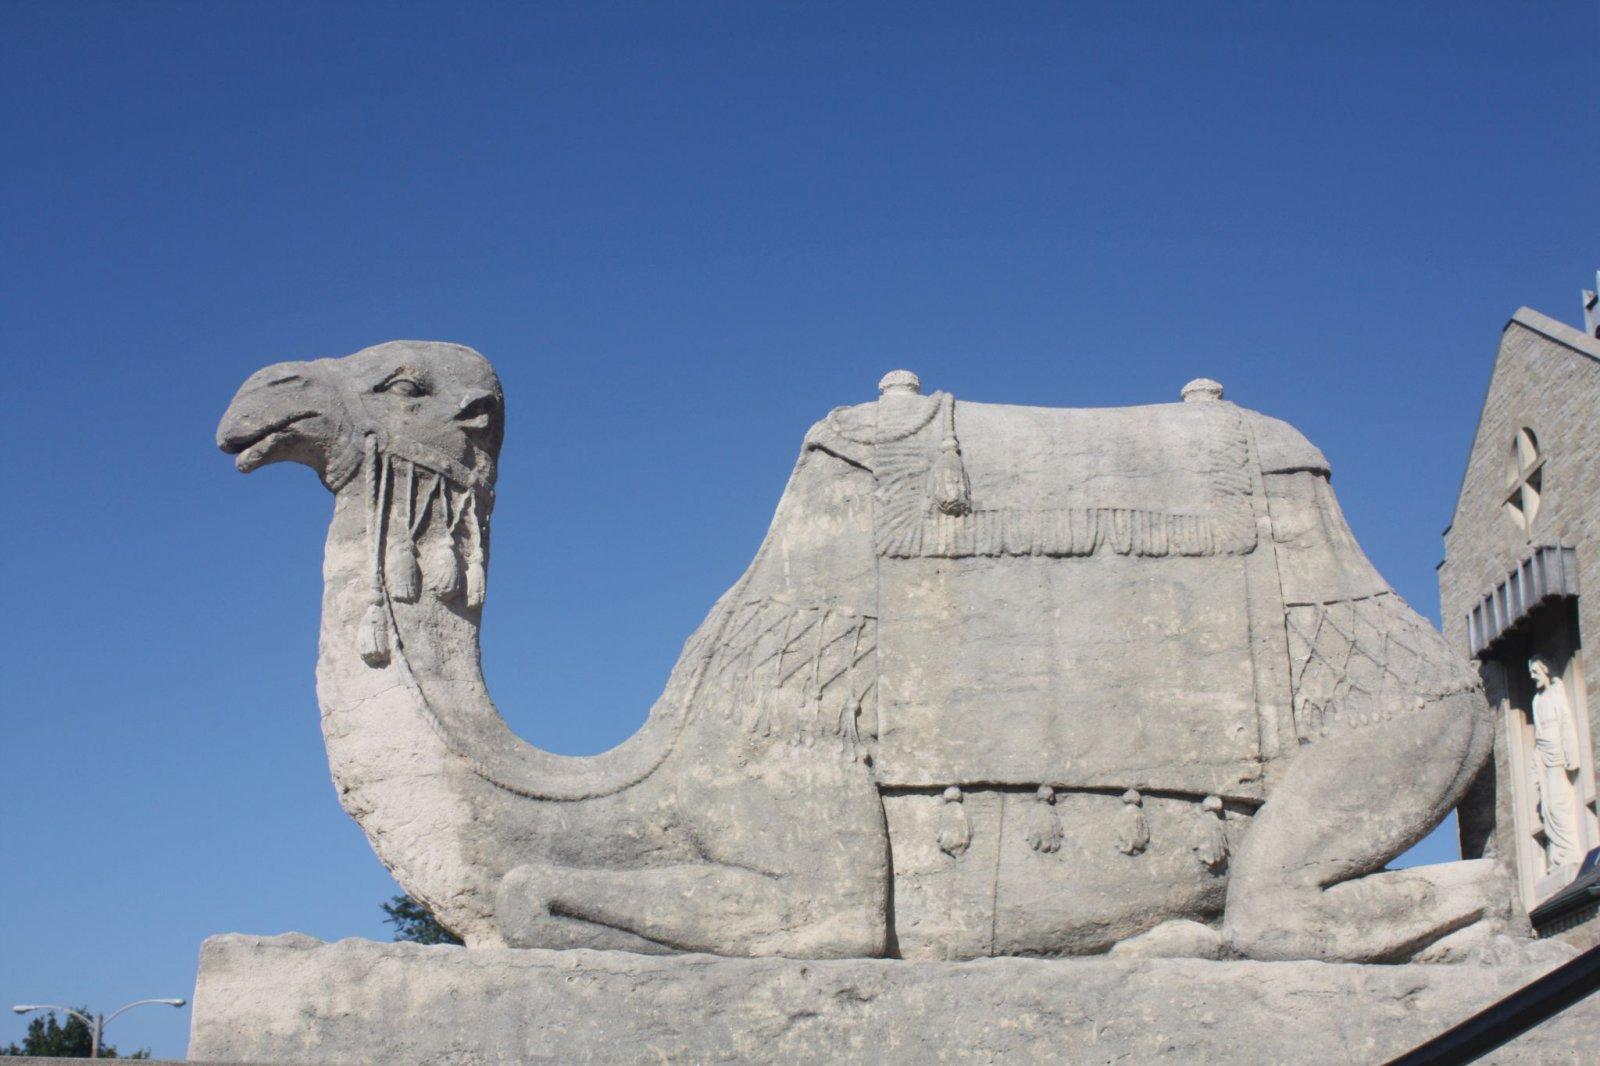 Camel at the Tripoli Shrine Center